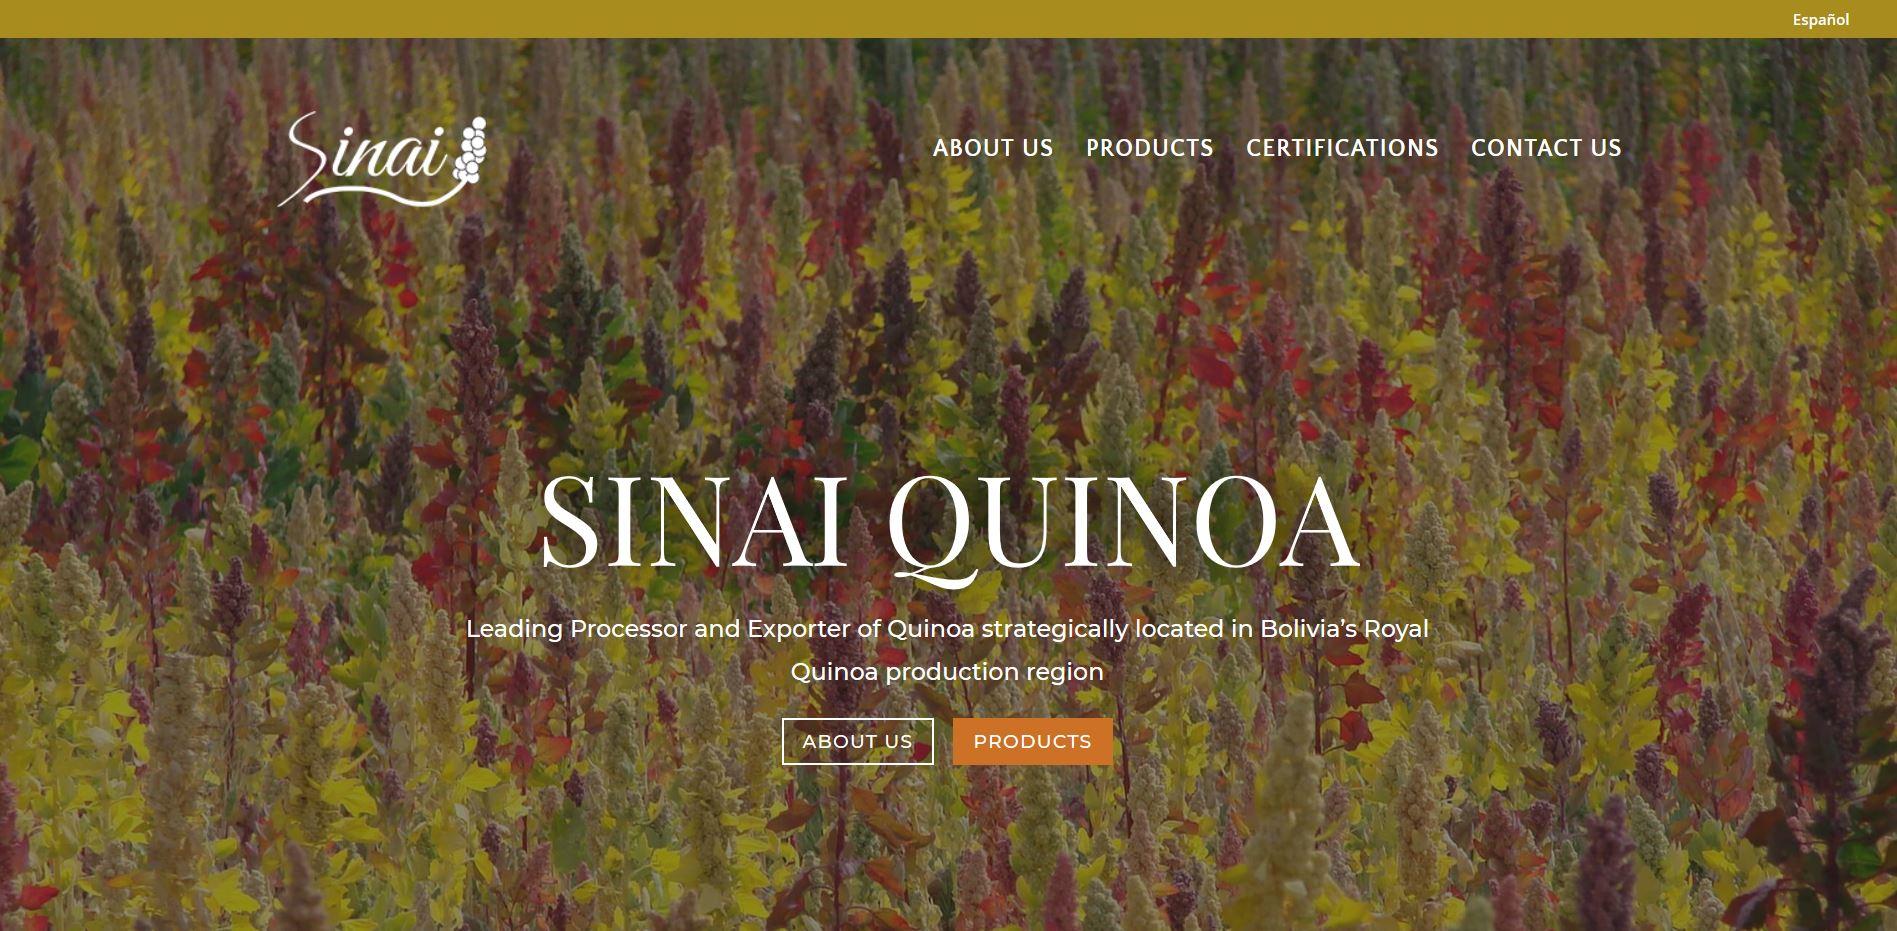 Sinai Quinoa Home